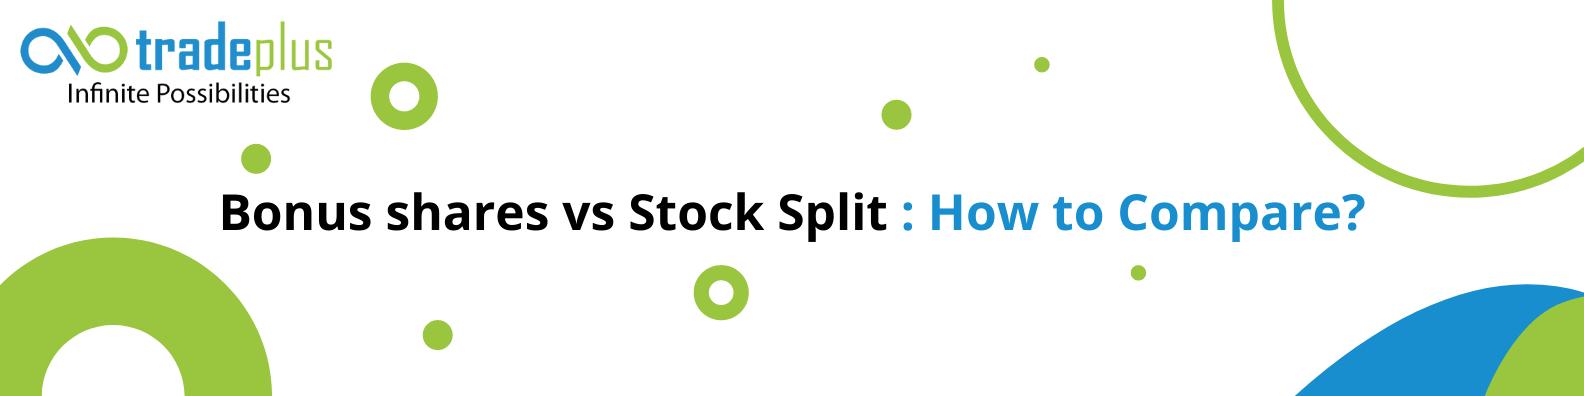 Bonus shares vs stock split how to compare 1 Bonus Shares vs Sock Split : How to Compare?